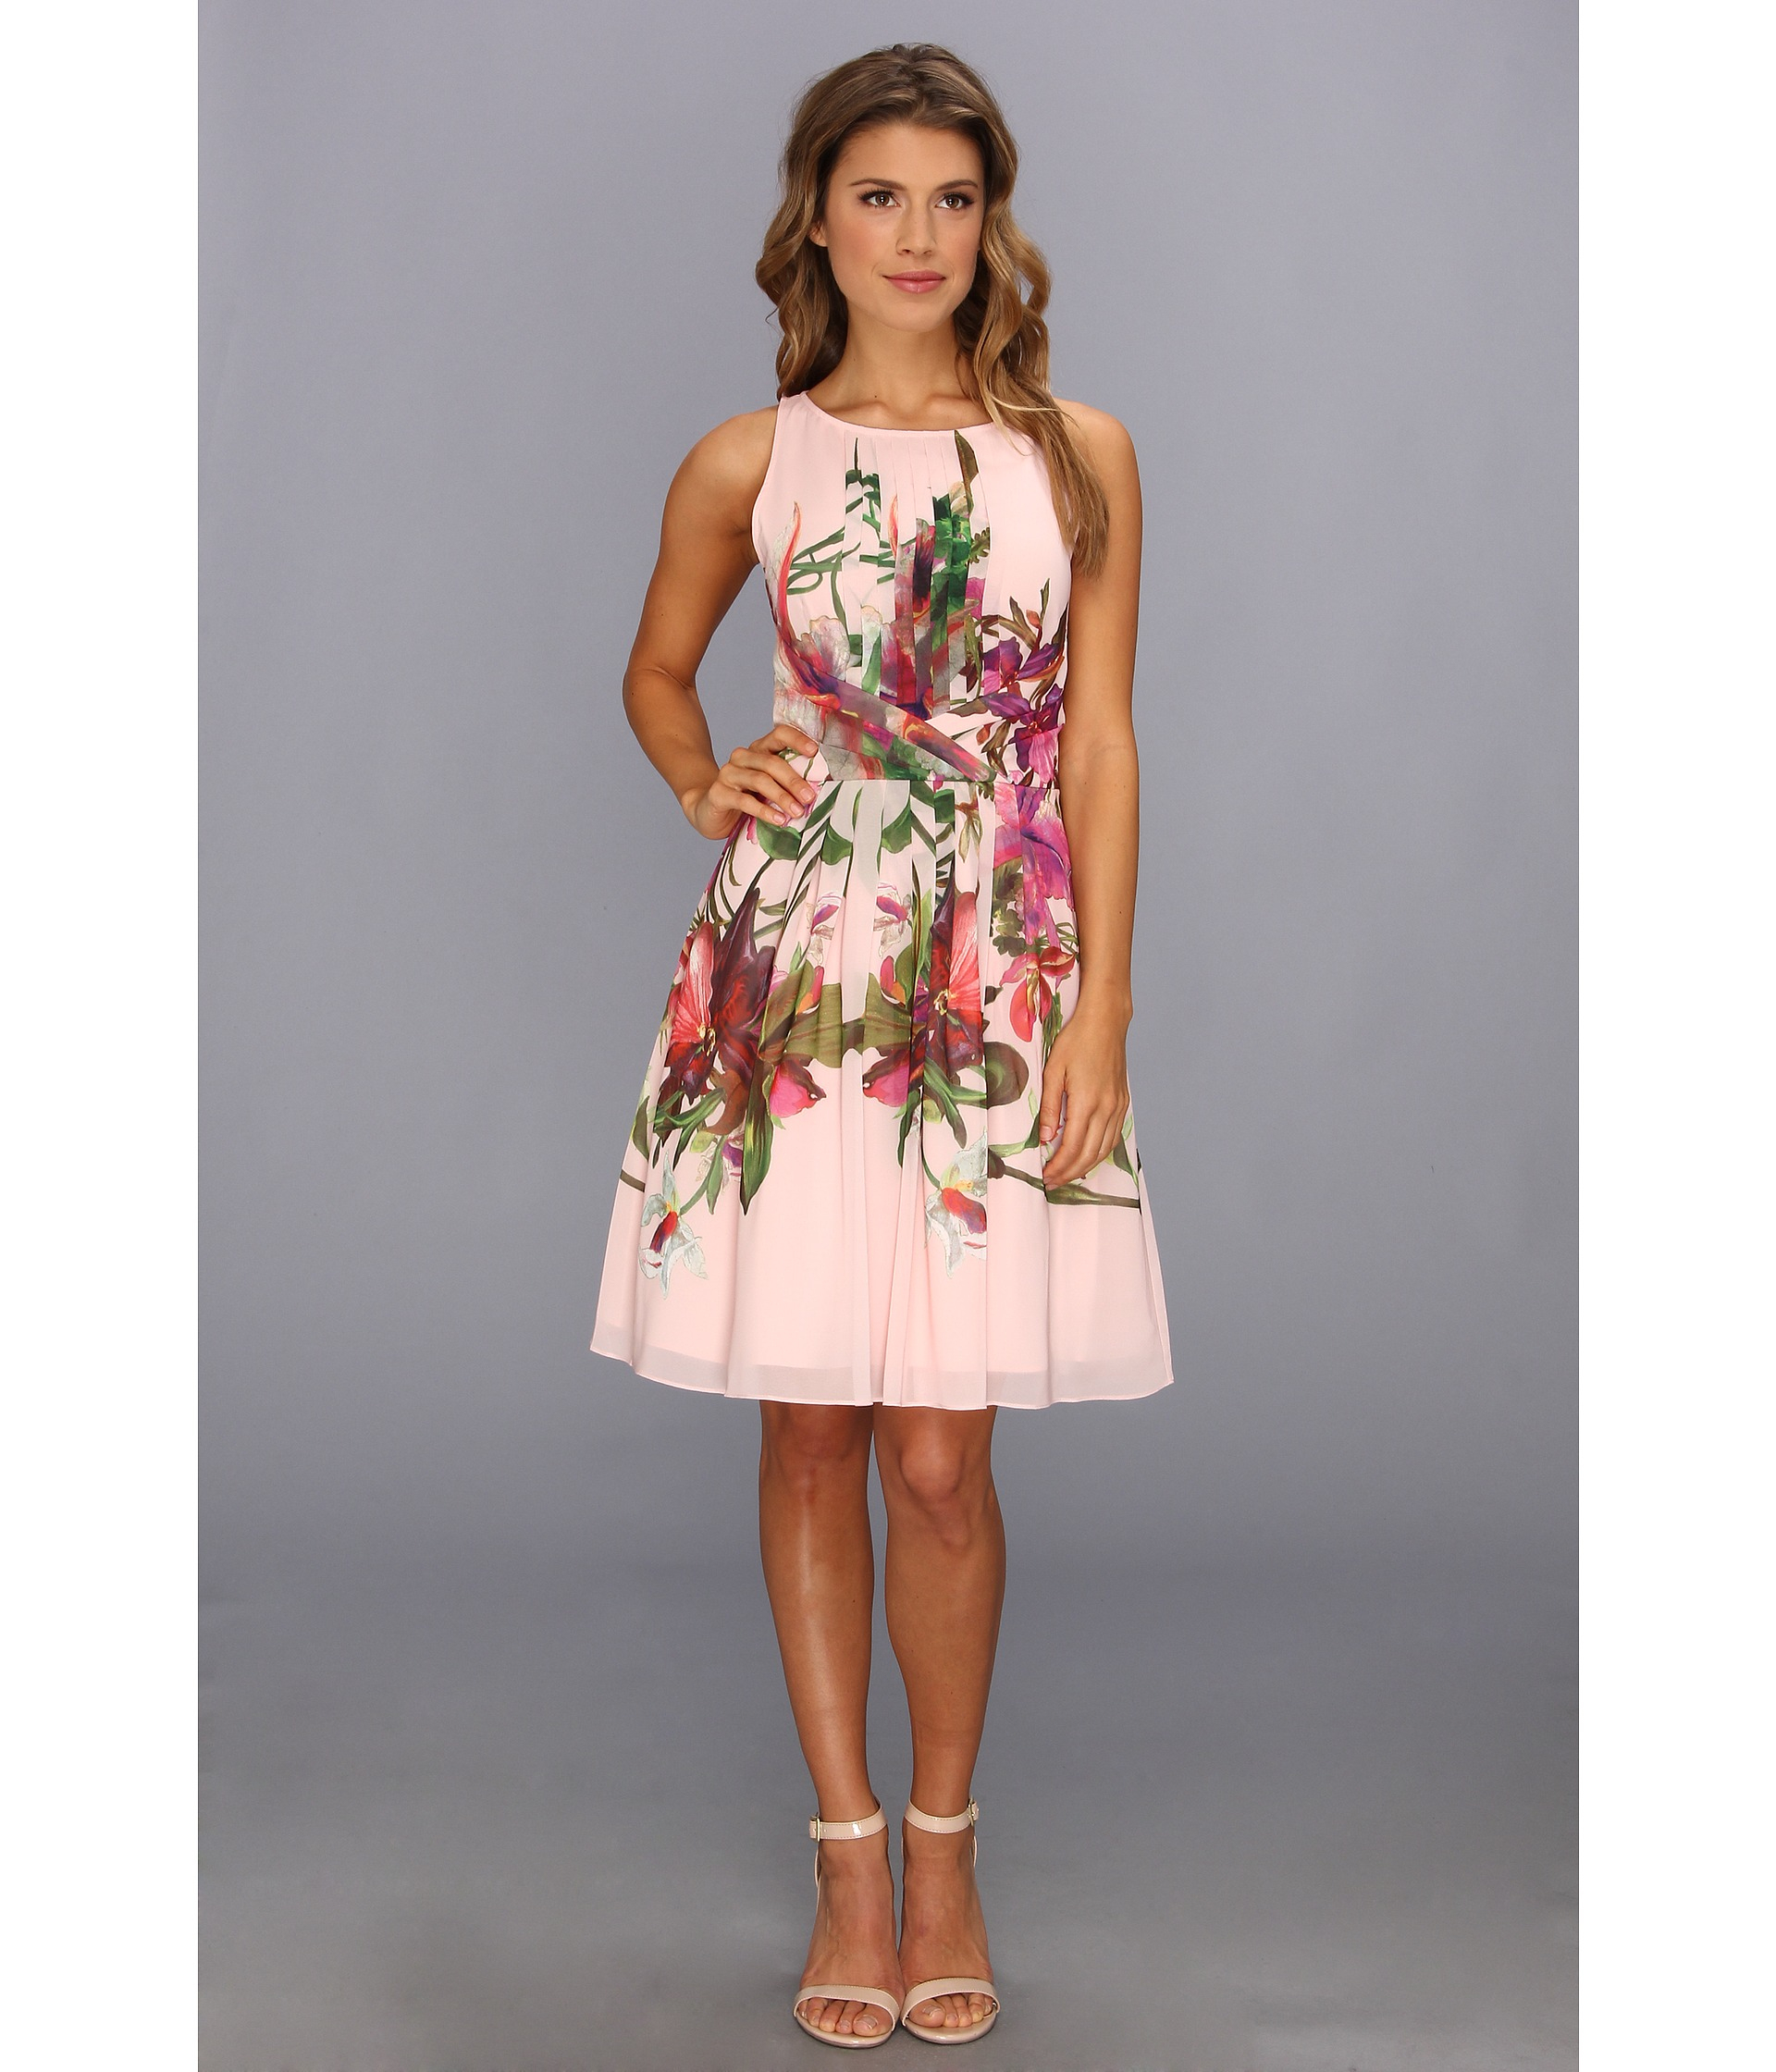 425eb0ad76320f Lyst - Ted Baker Carlii Symmetrical Orchid Print Dress